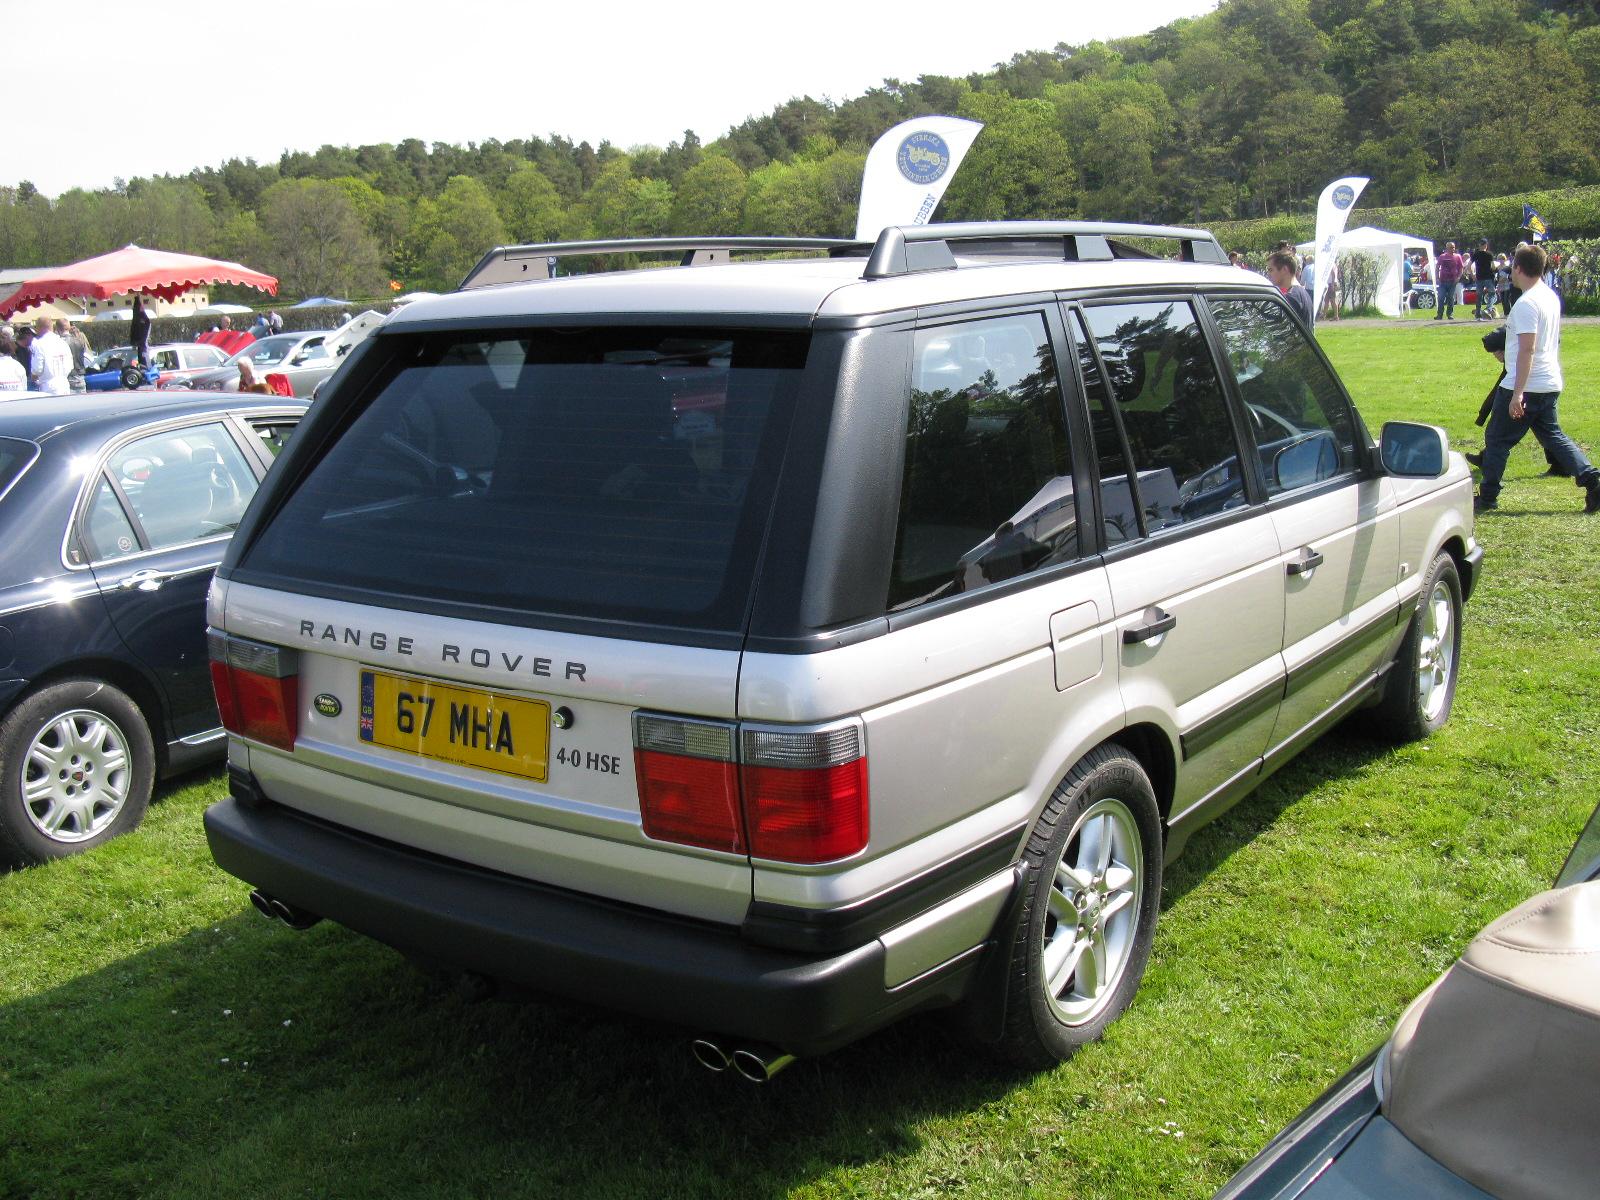 File Range Rover 4 0 HSE Wikimedia mons